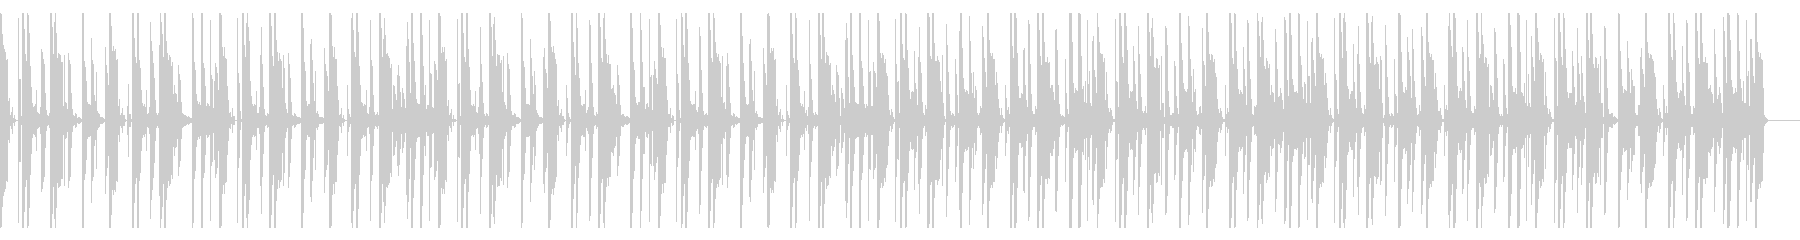 120 BPMの未再生の波形